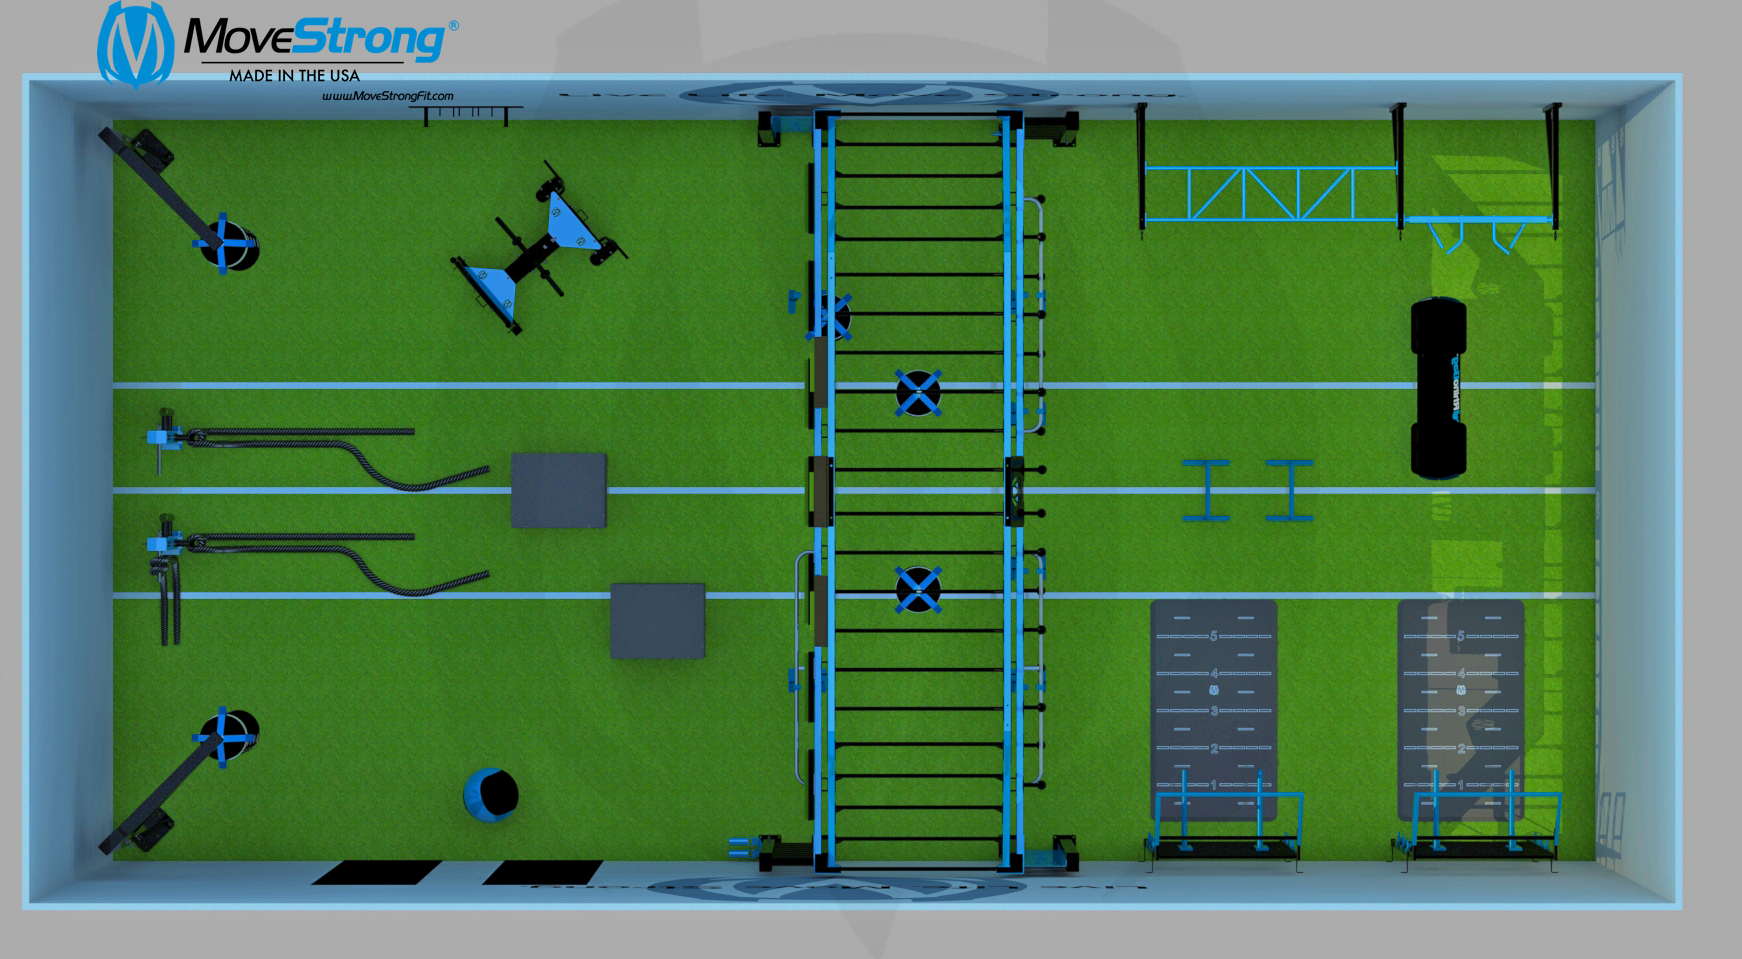 U of Miami_Raquetball Court - 3C.png